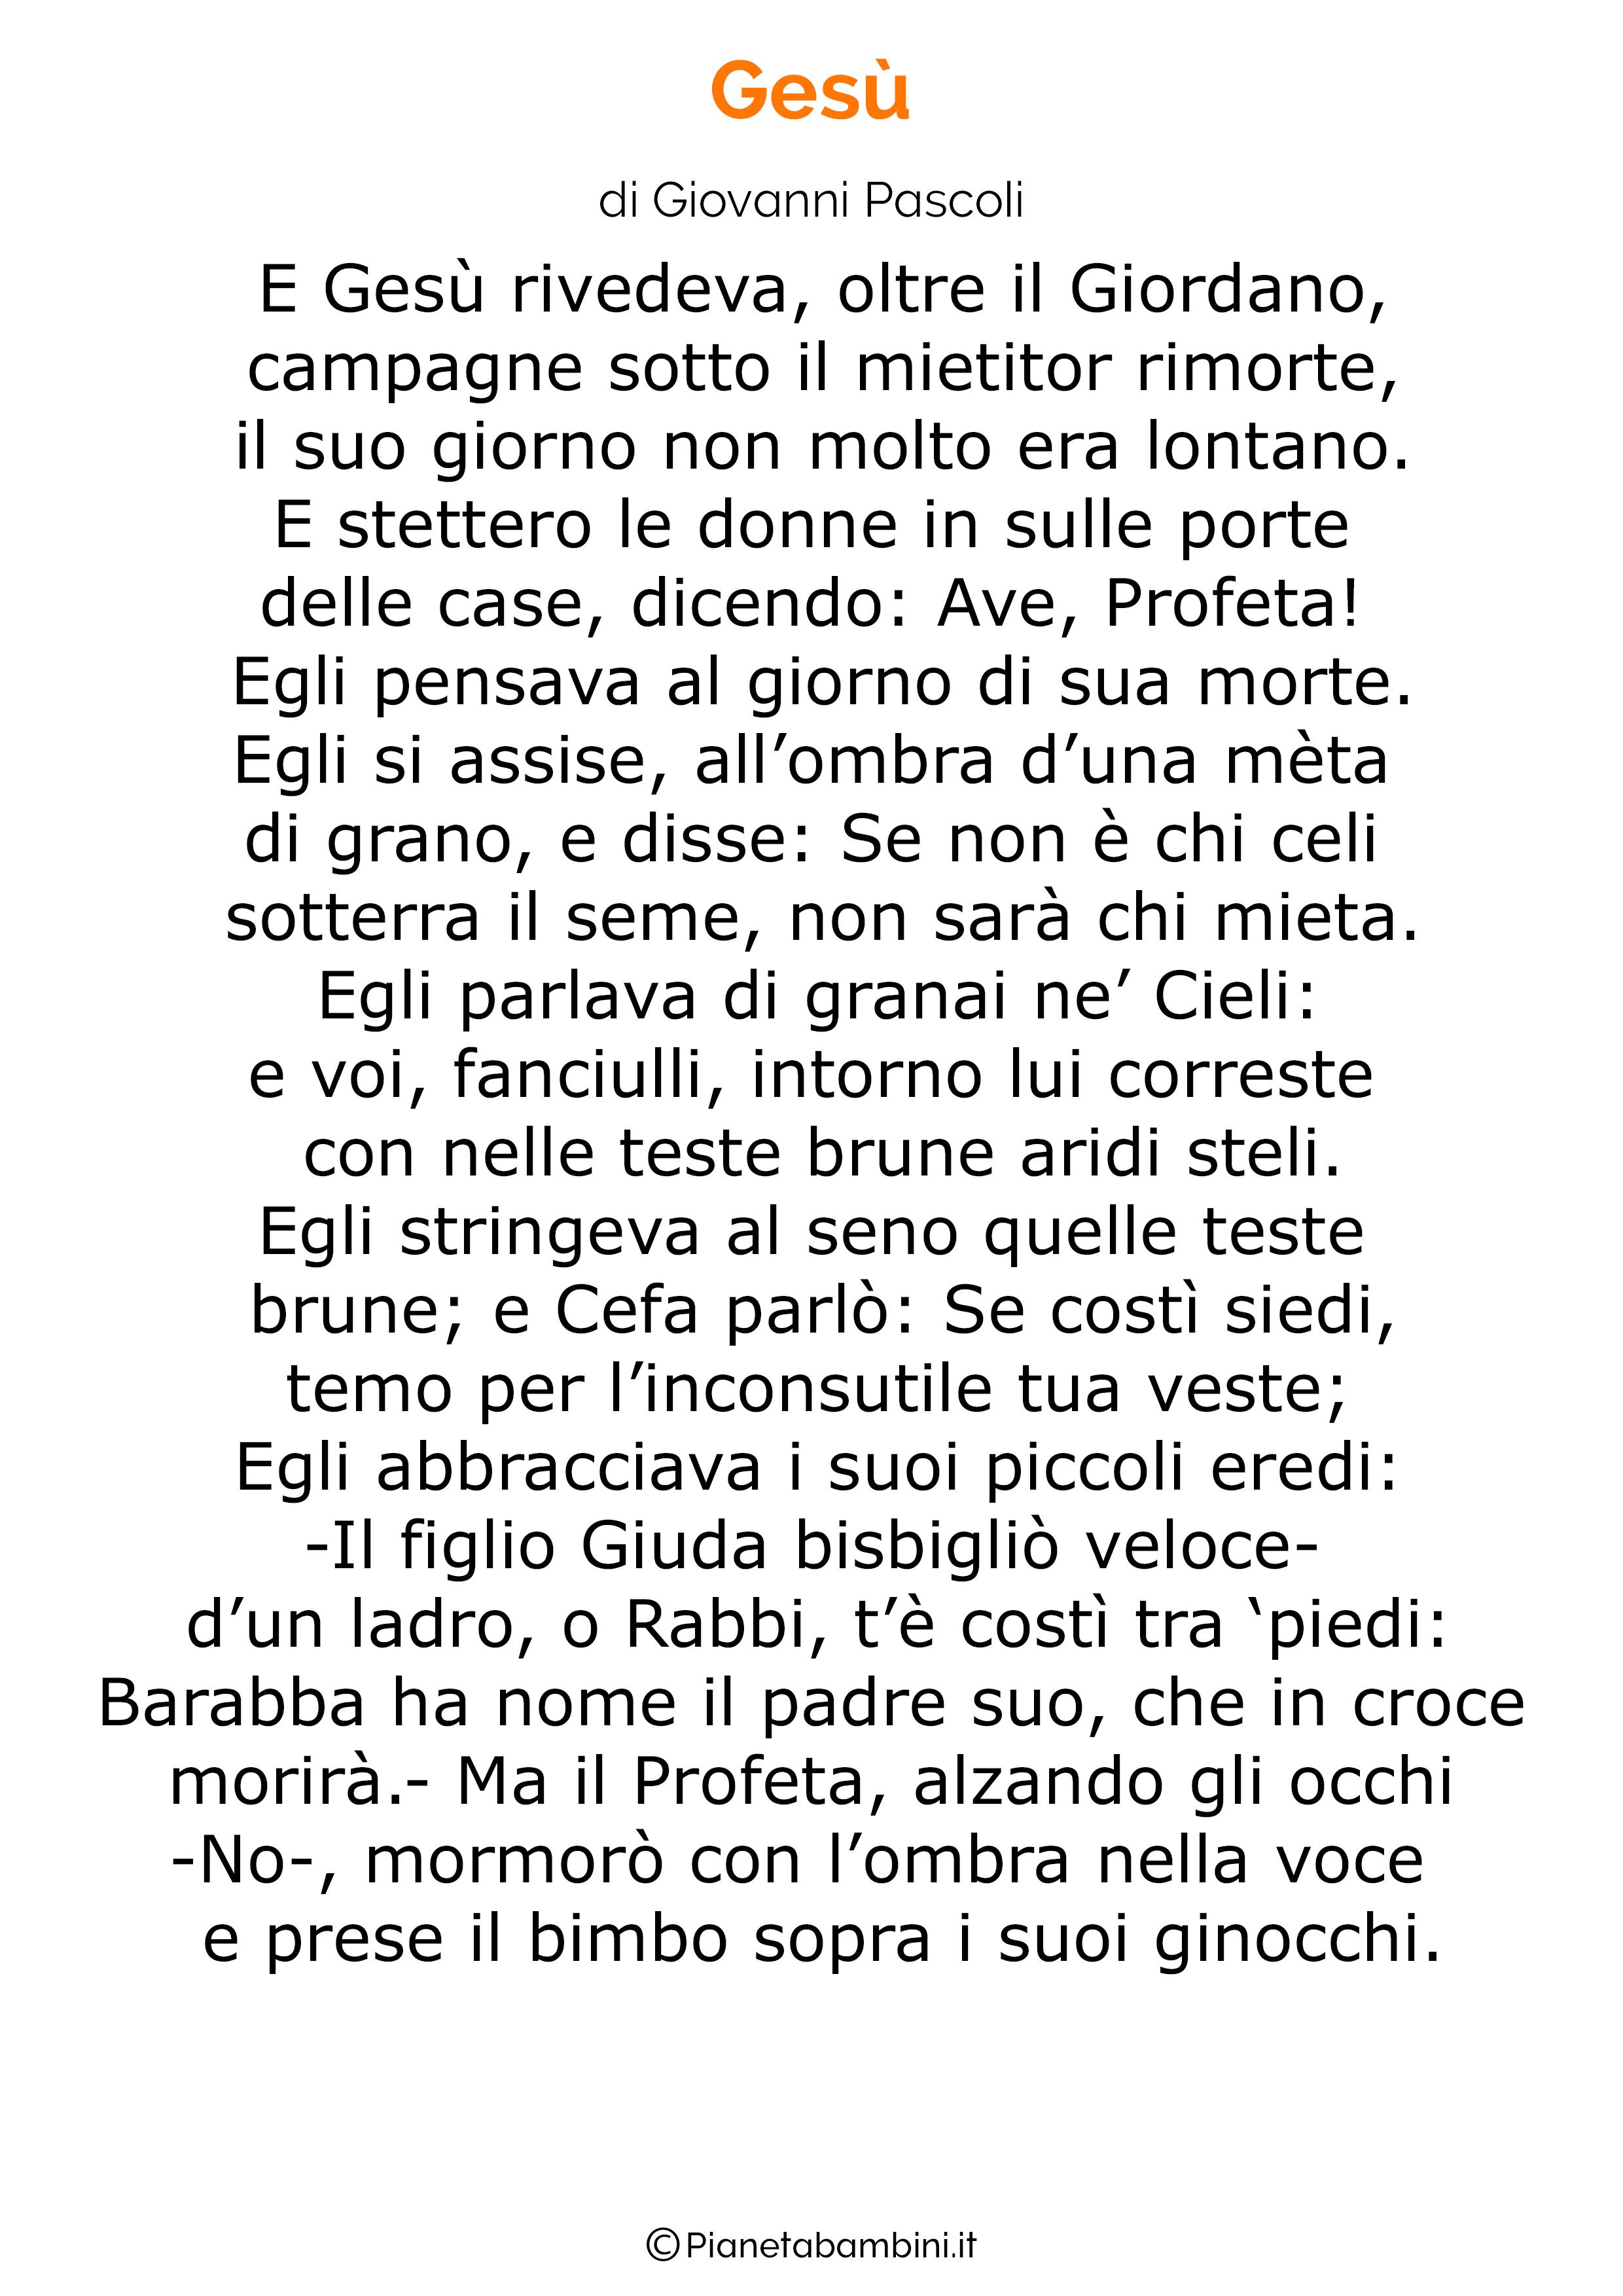 Poesia di Pasqua 13